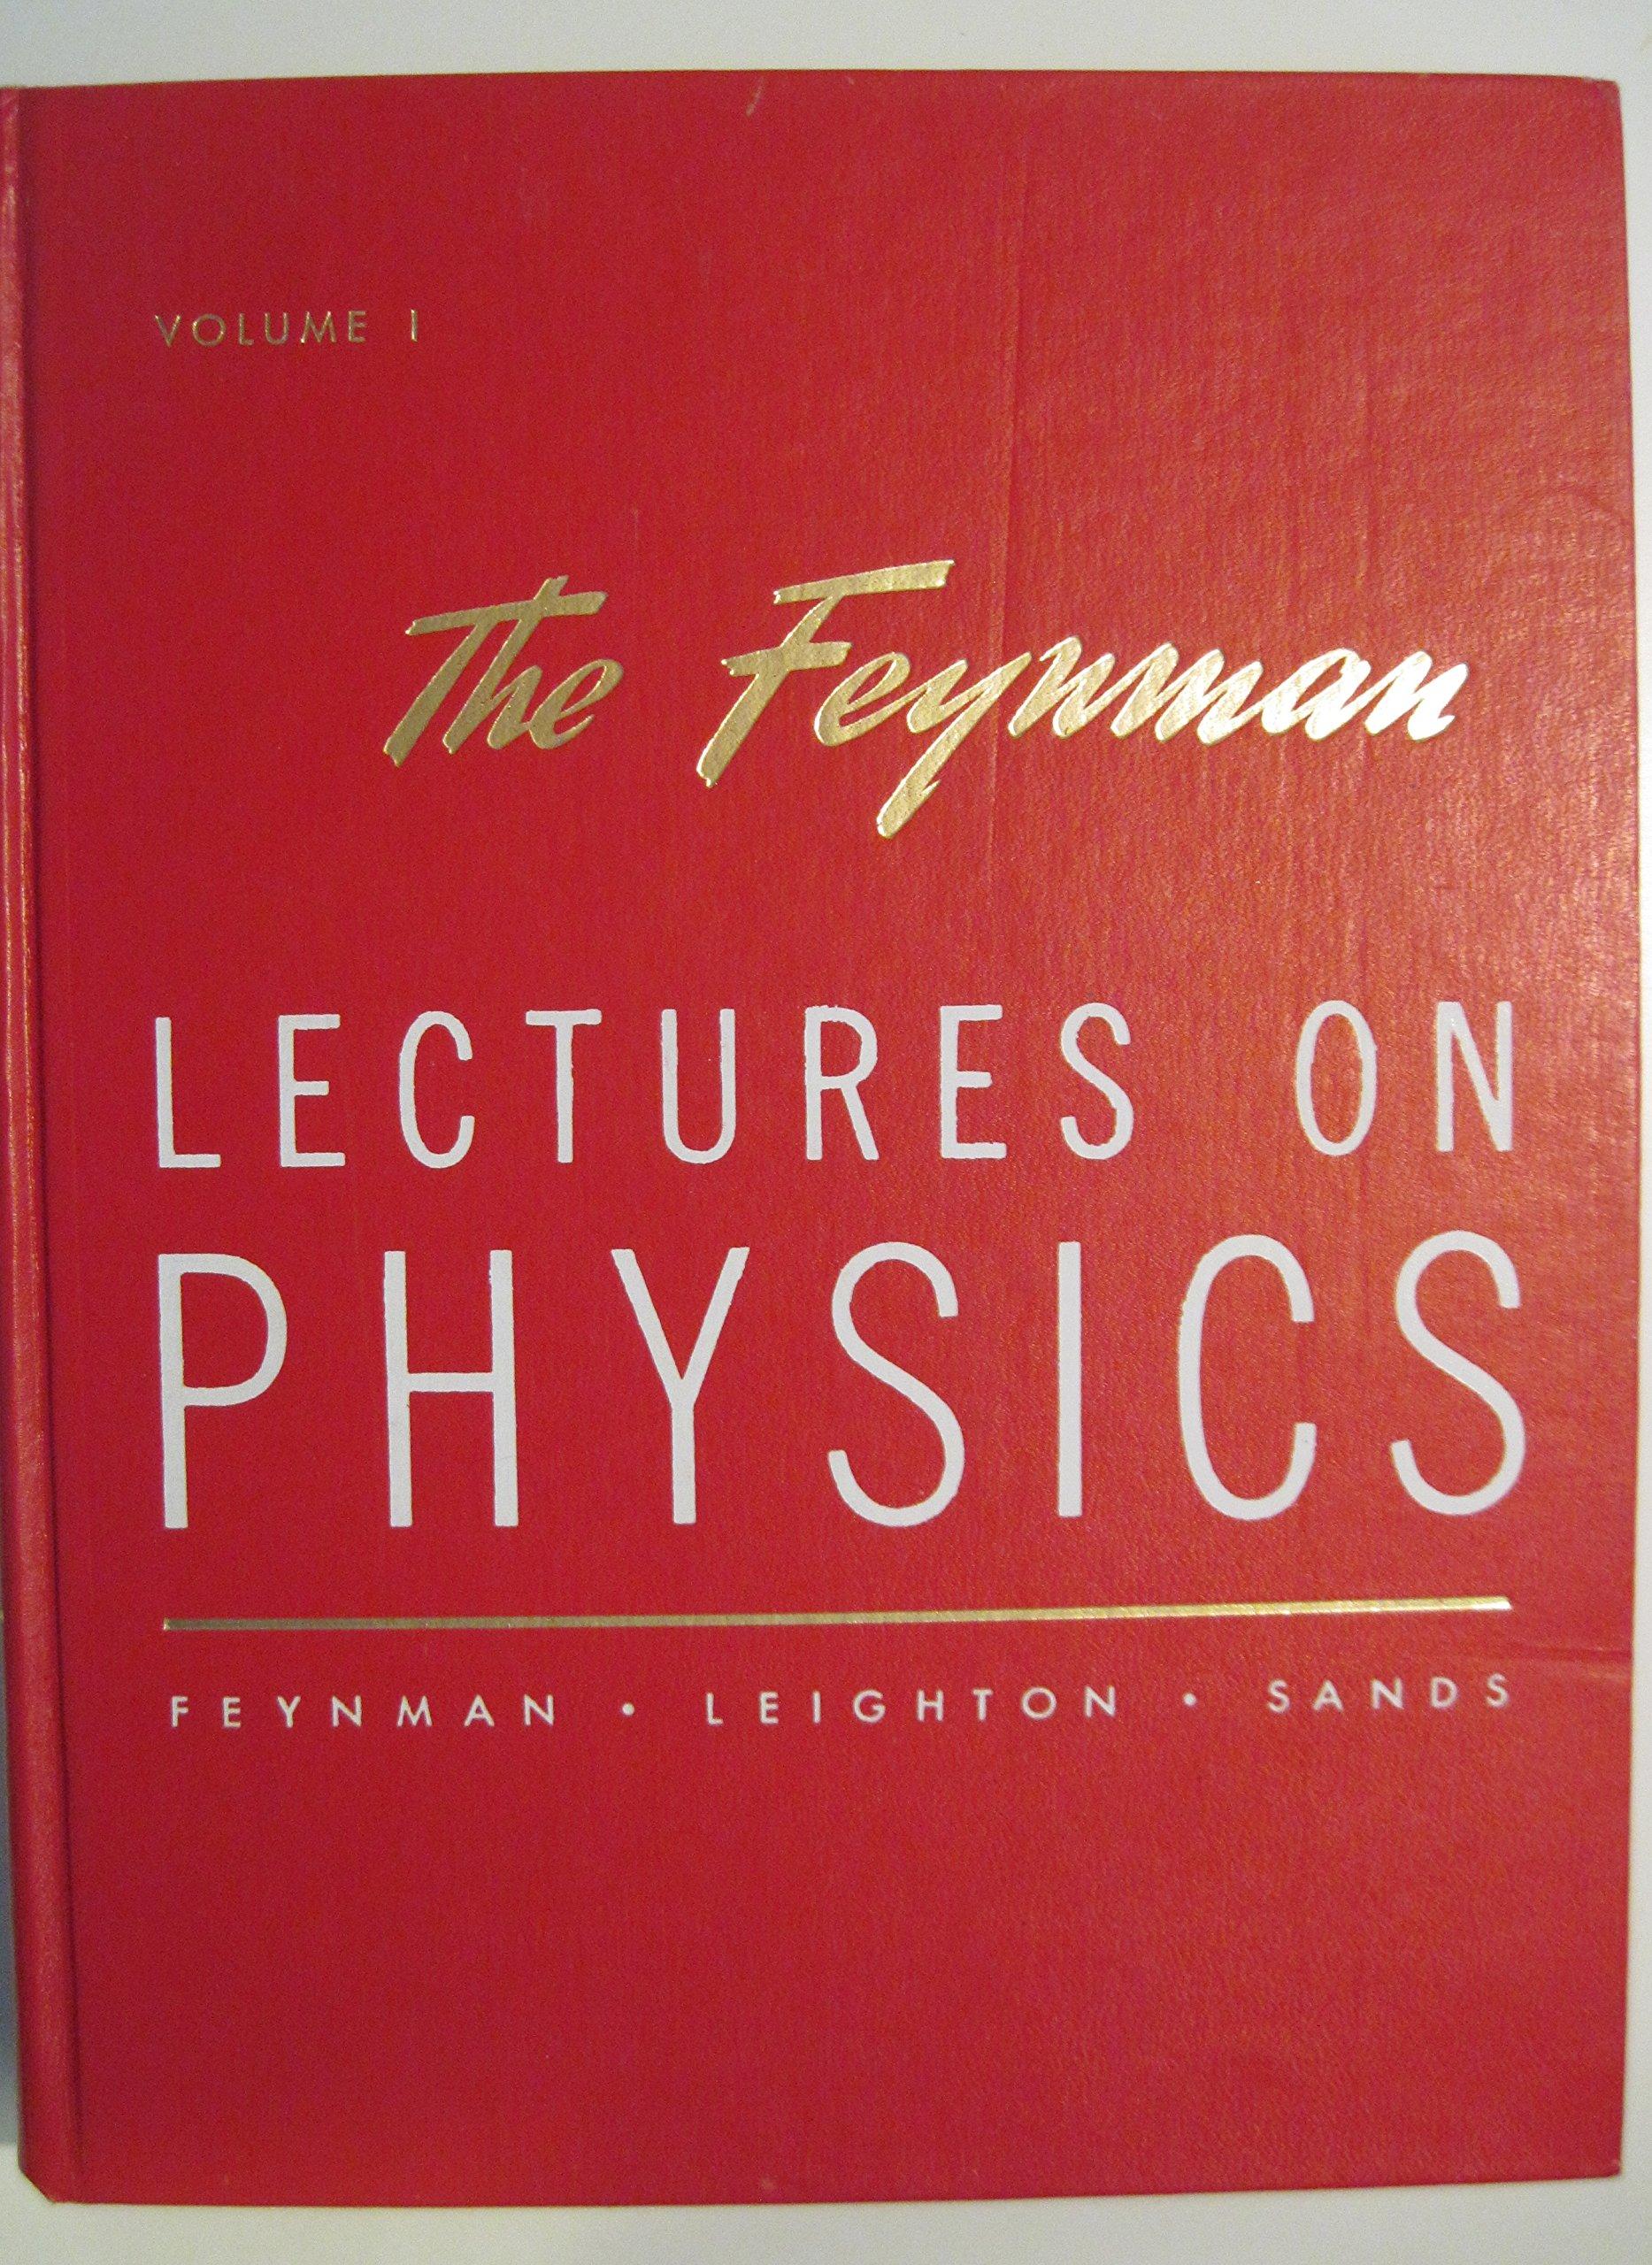 The Feynman Lectures on Physics: Richard Phillips Feynman: 9780201020106:  Amazon.com: Books